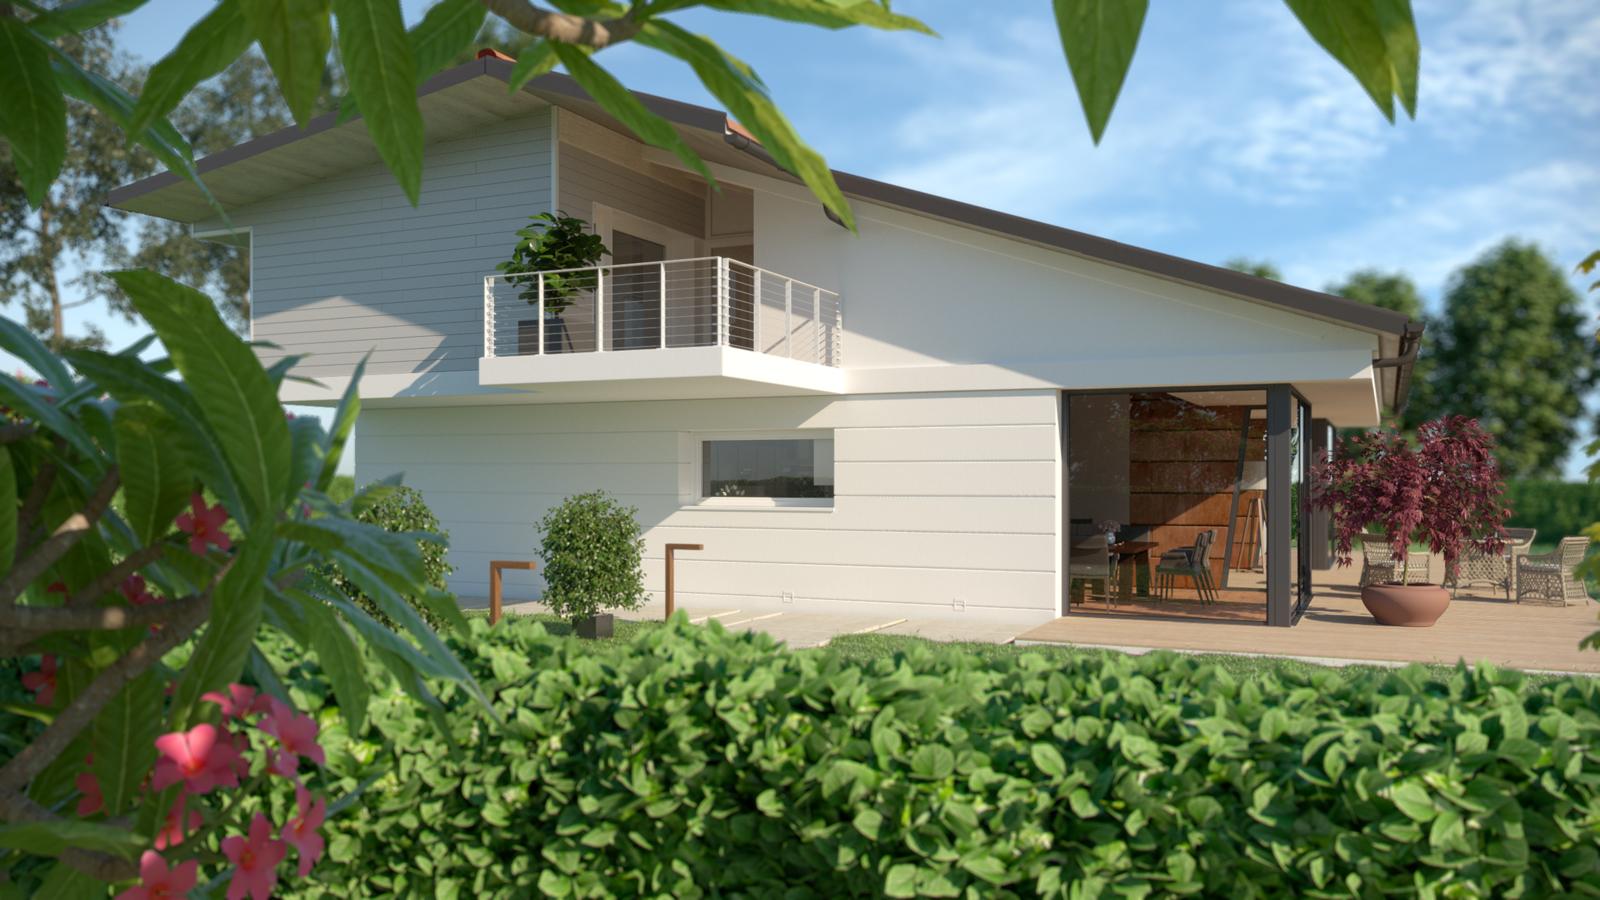 Render 3d rendering architettonico edilizia arredo urbano for Rendering giardino